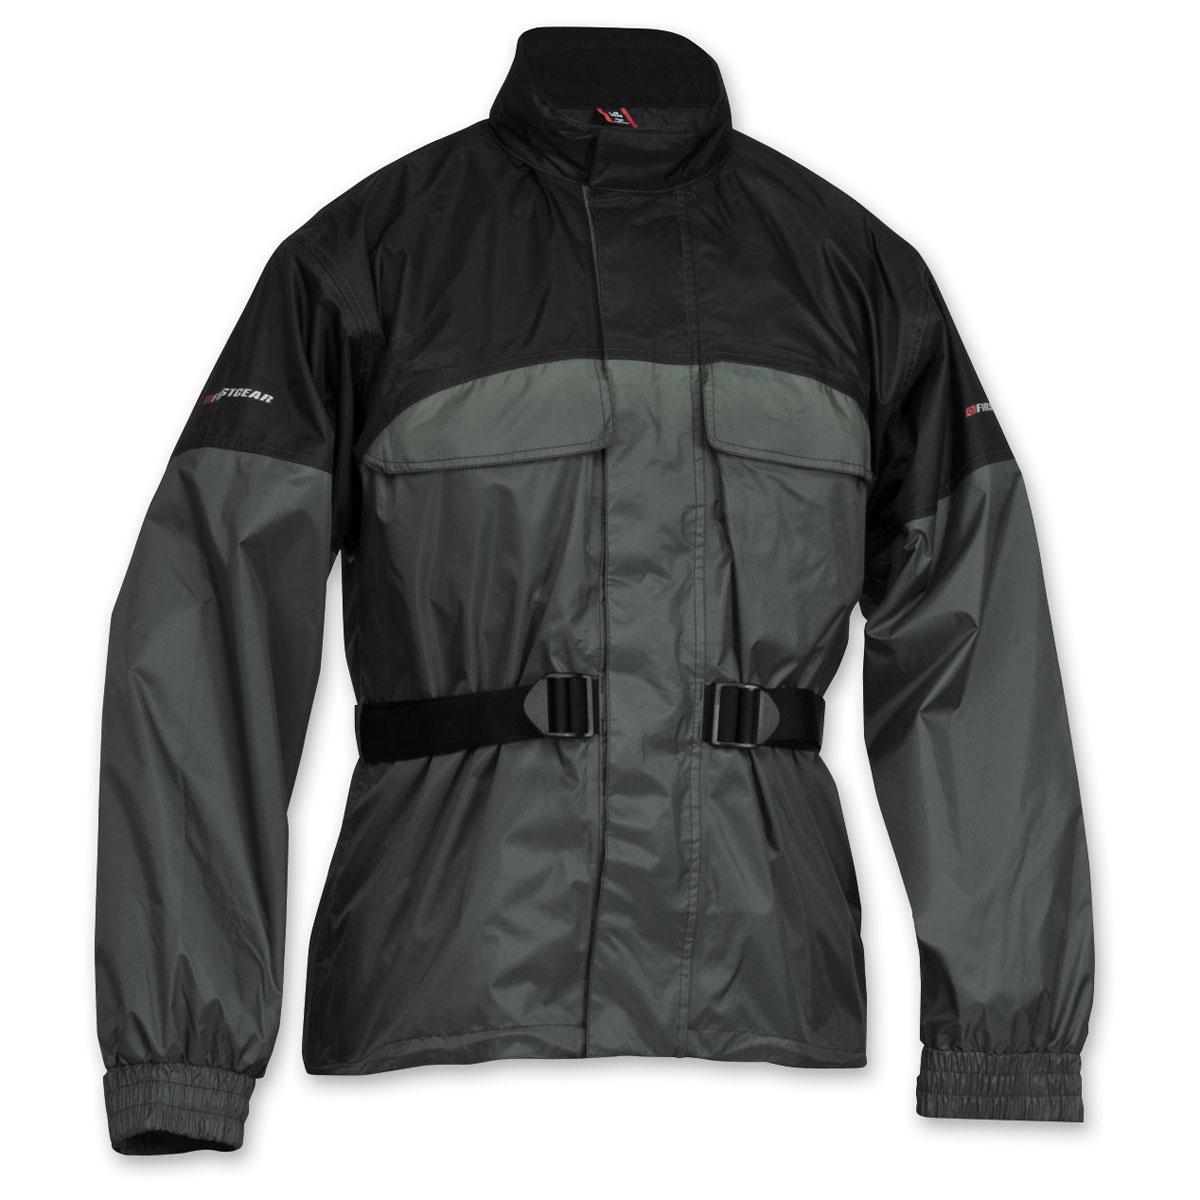 Firstgear Men's Rainman Black/Silver Rain Jacket